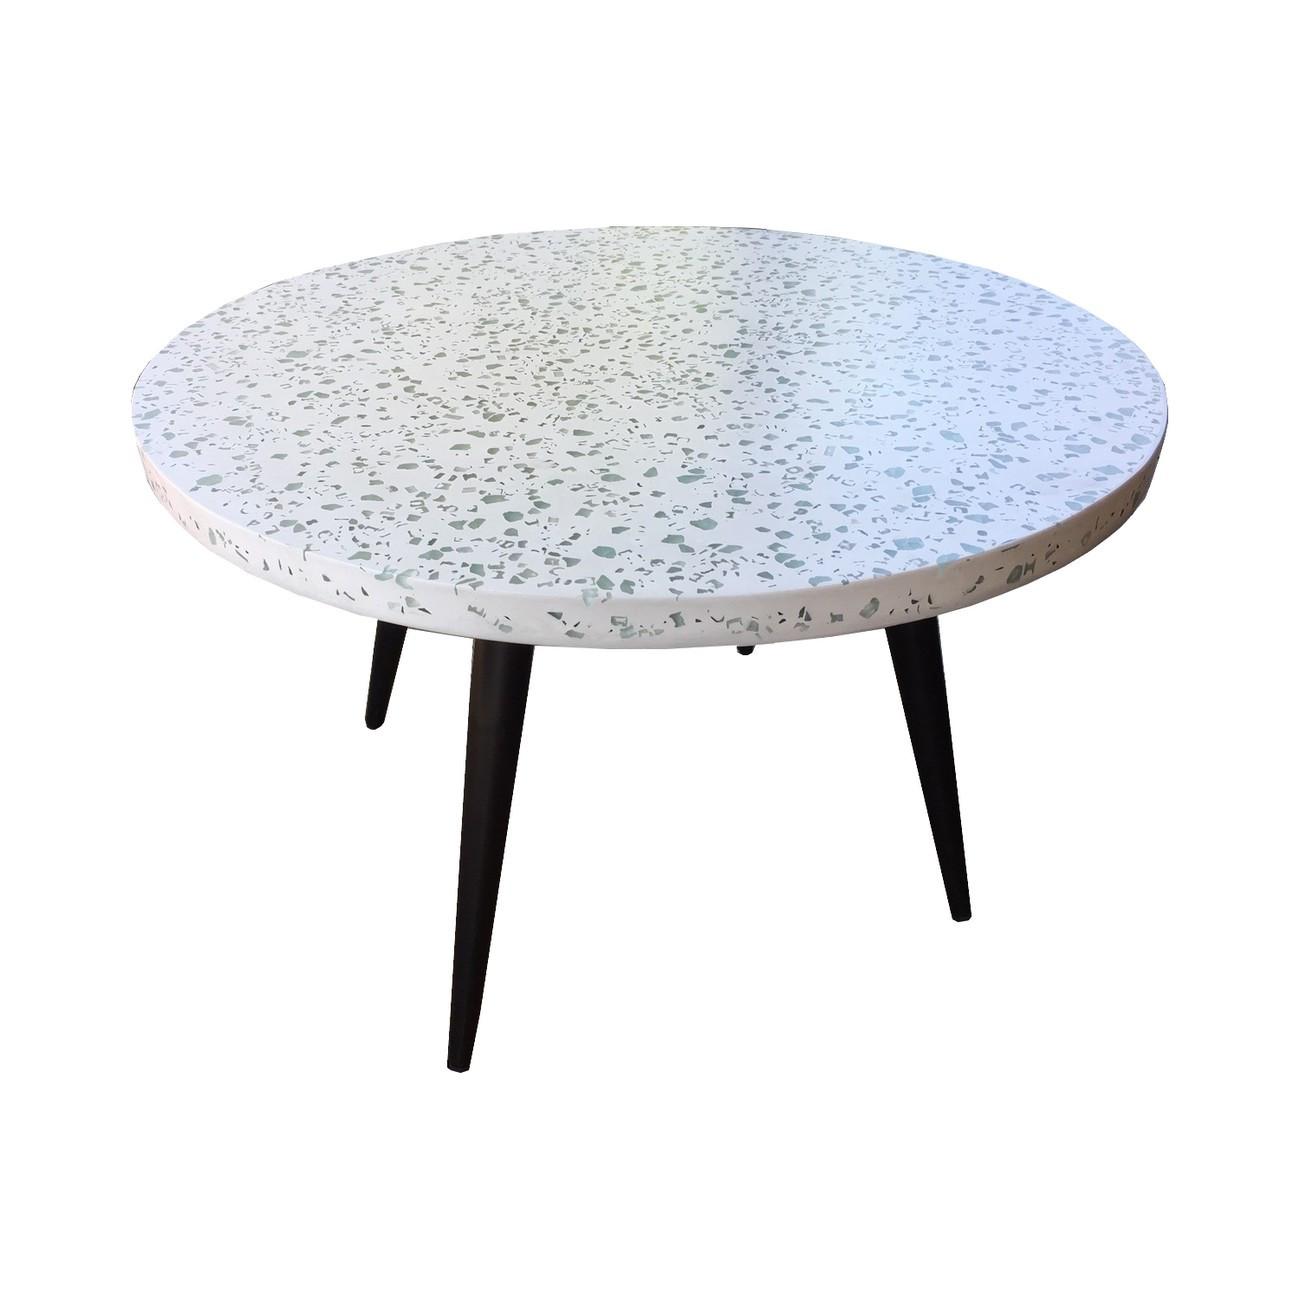 Table basse terrazzo blanc L70